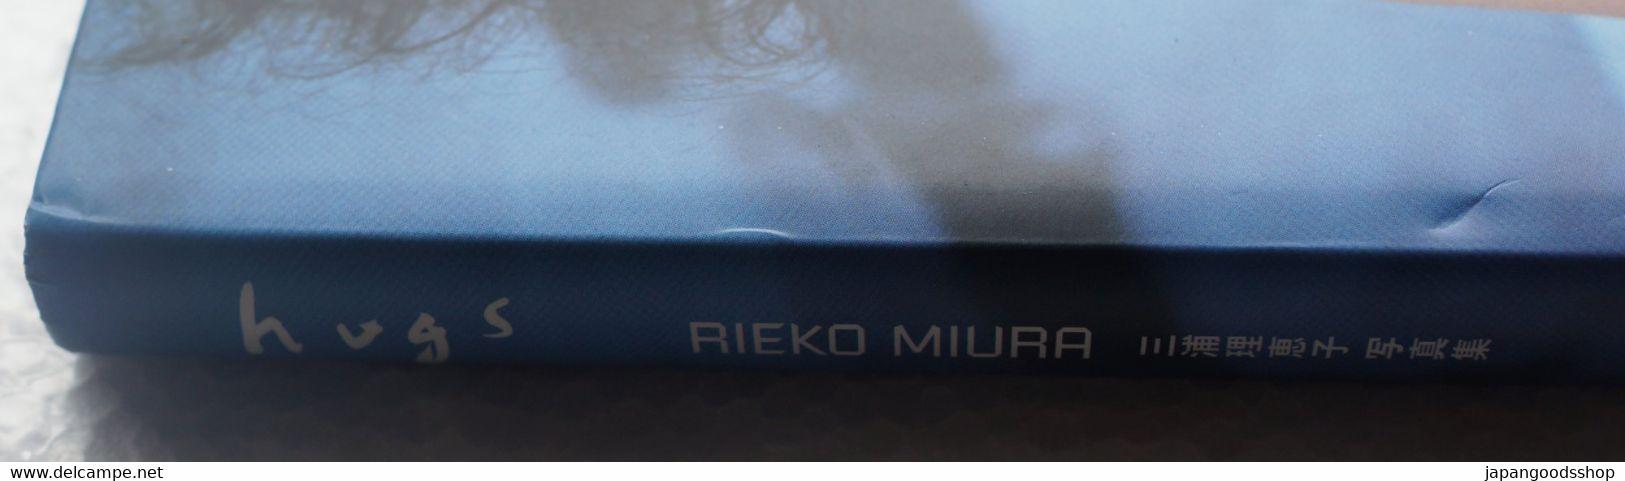 """ Hugs "" Rieko Miura, Photographs : Katsumi Ohmura - Books, Magazines, Comics"